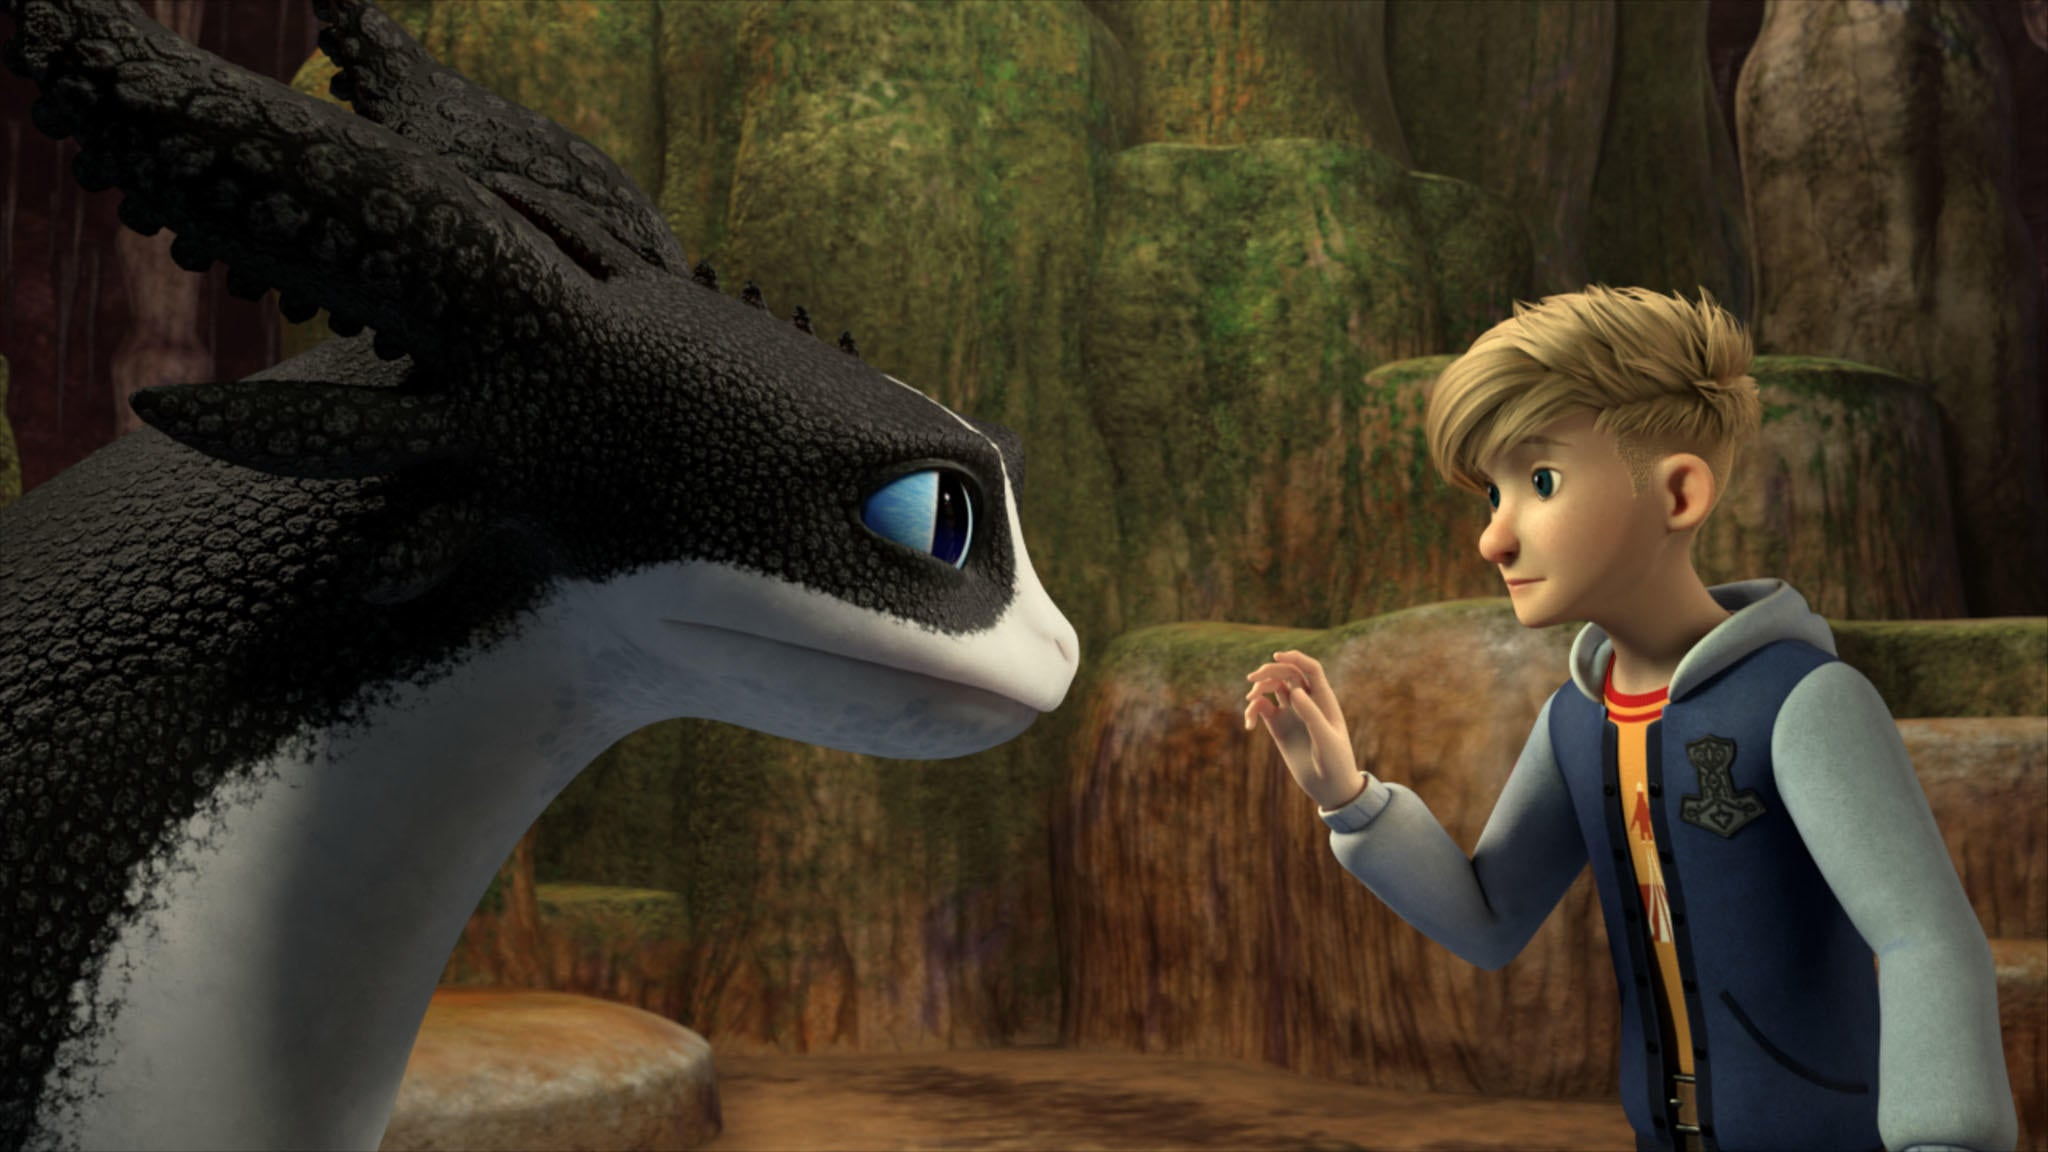 dragons-the-hidden-realms-dreamworks-hulu-peacock